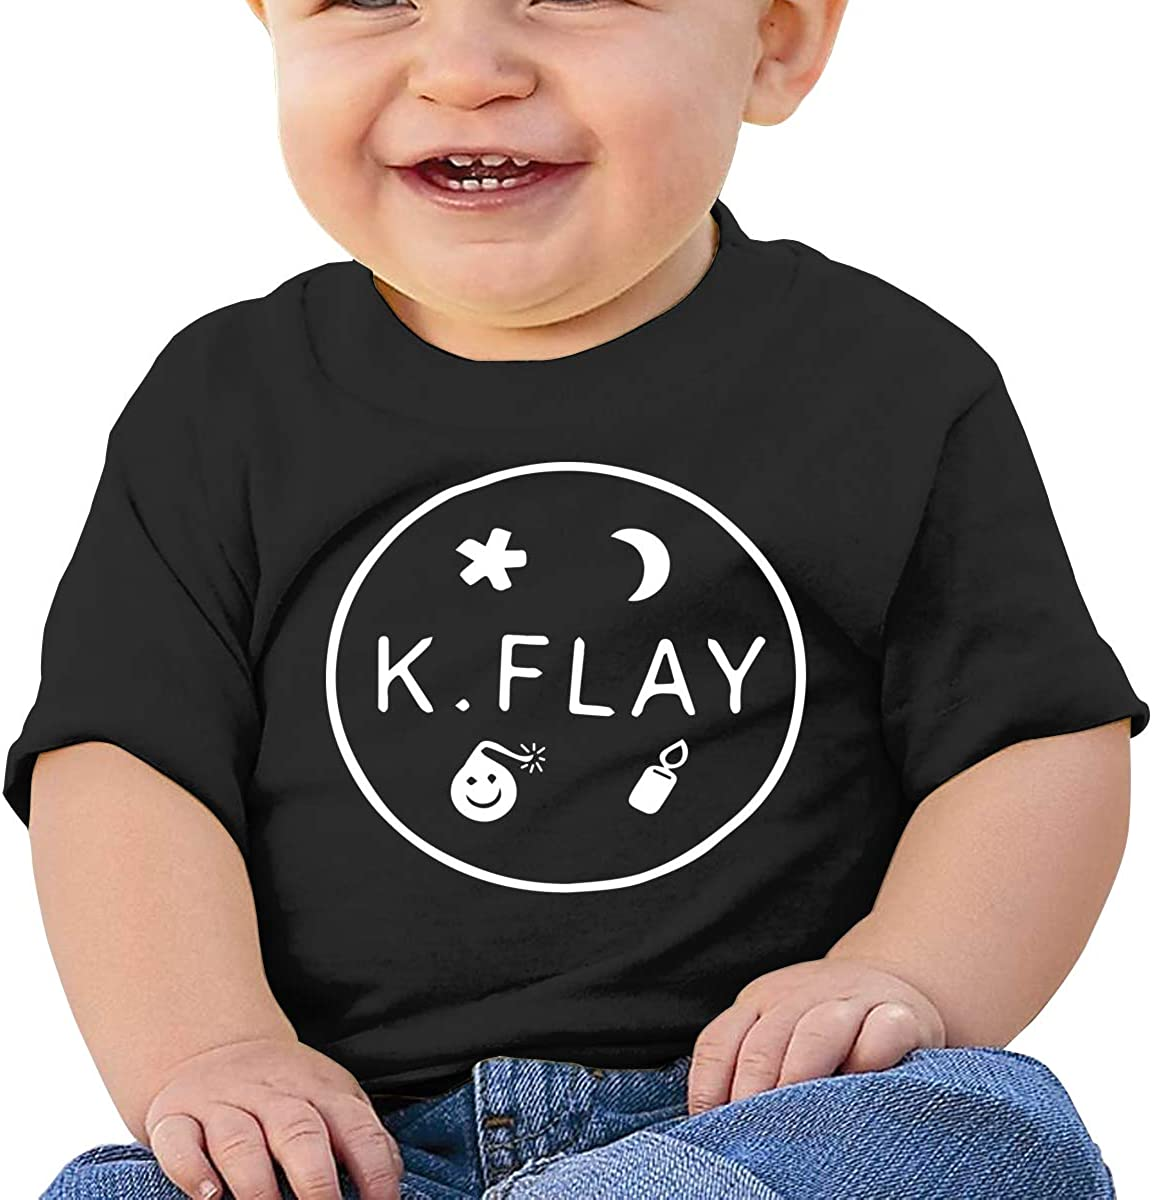 Baby K-Flay Shirt Toddler Cotton Tee